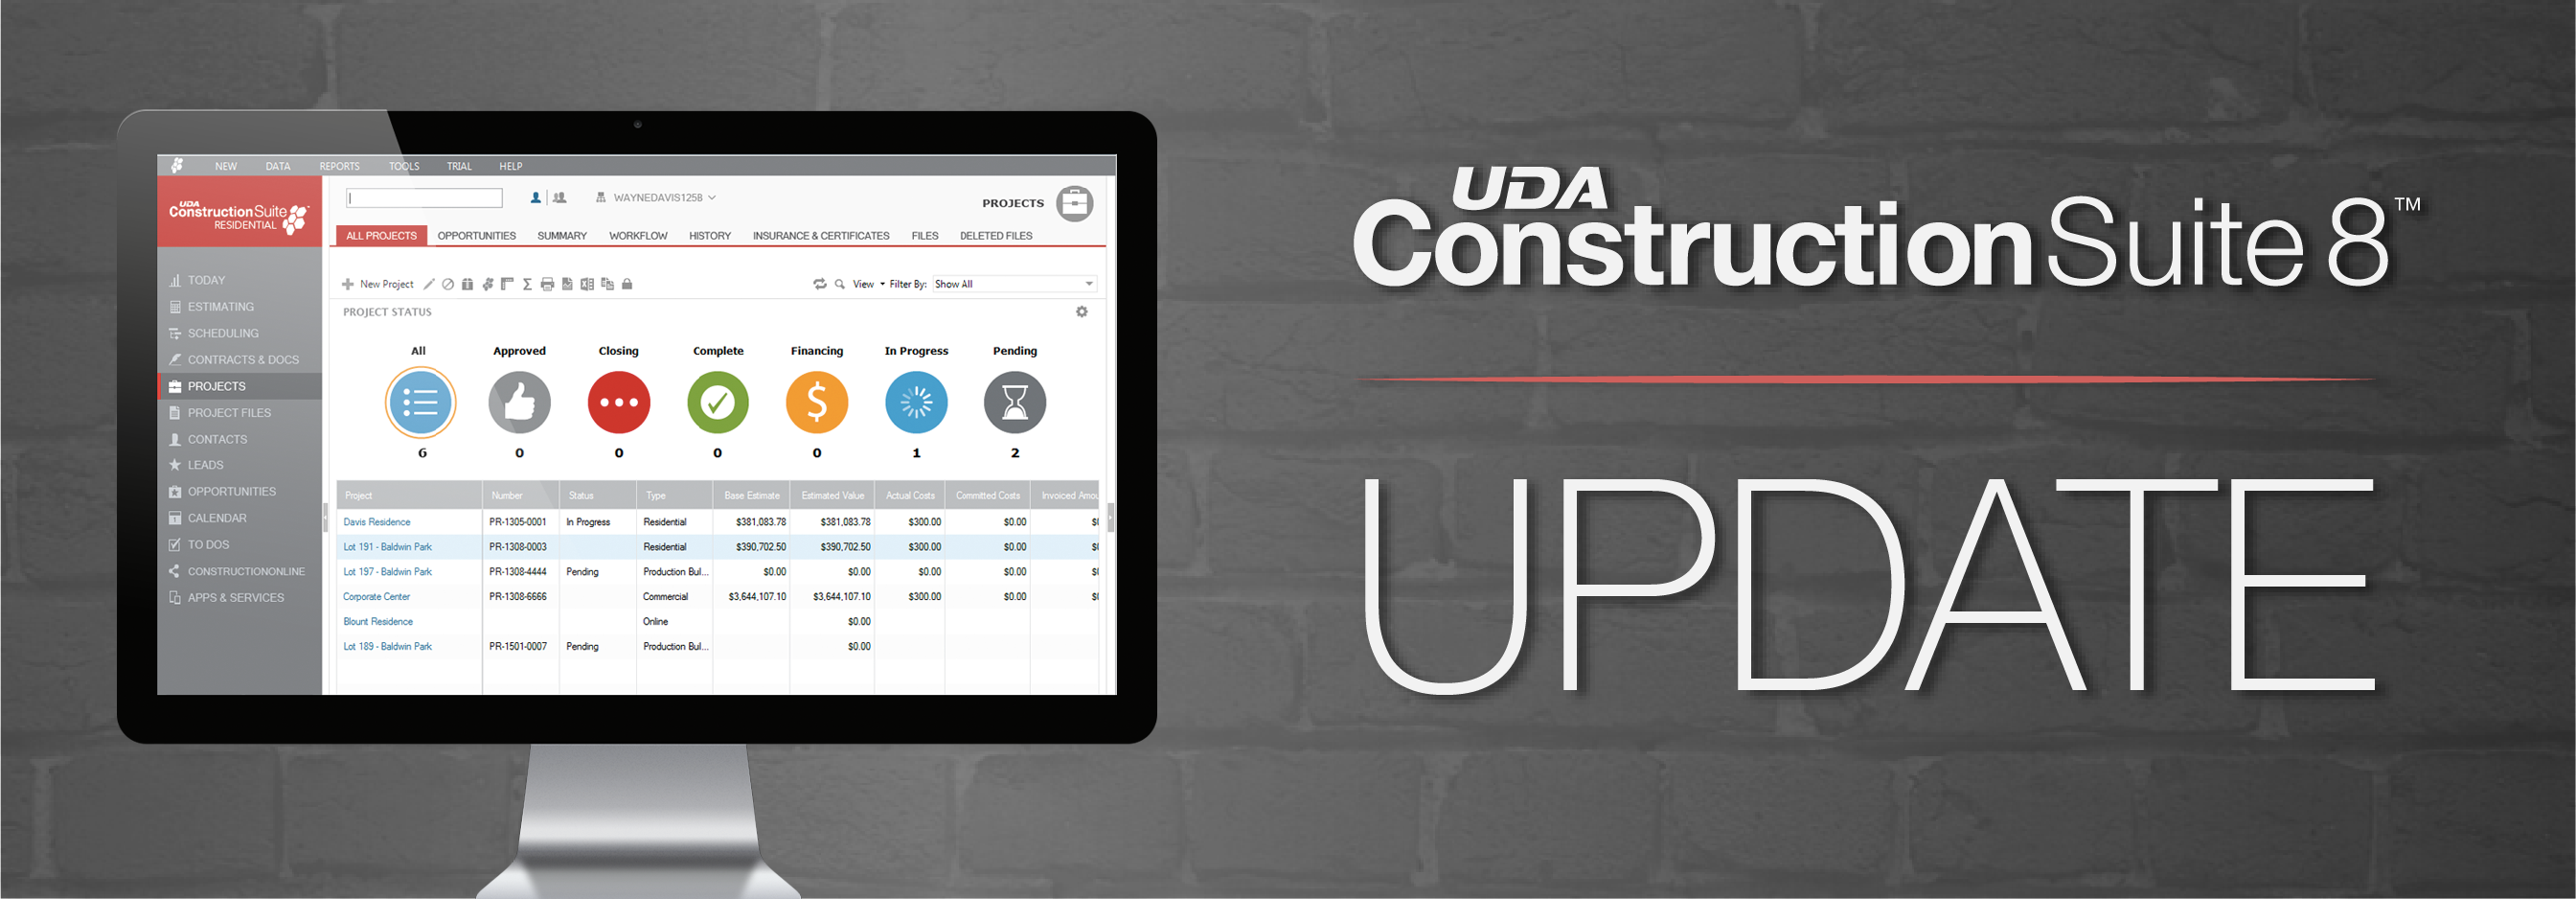 ConstructionSuite Expands File Import Types